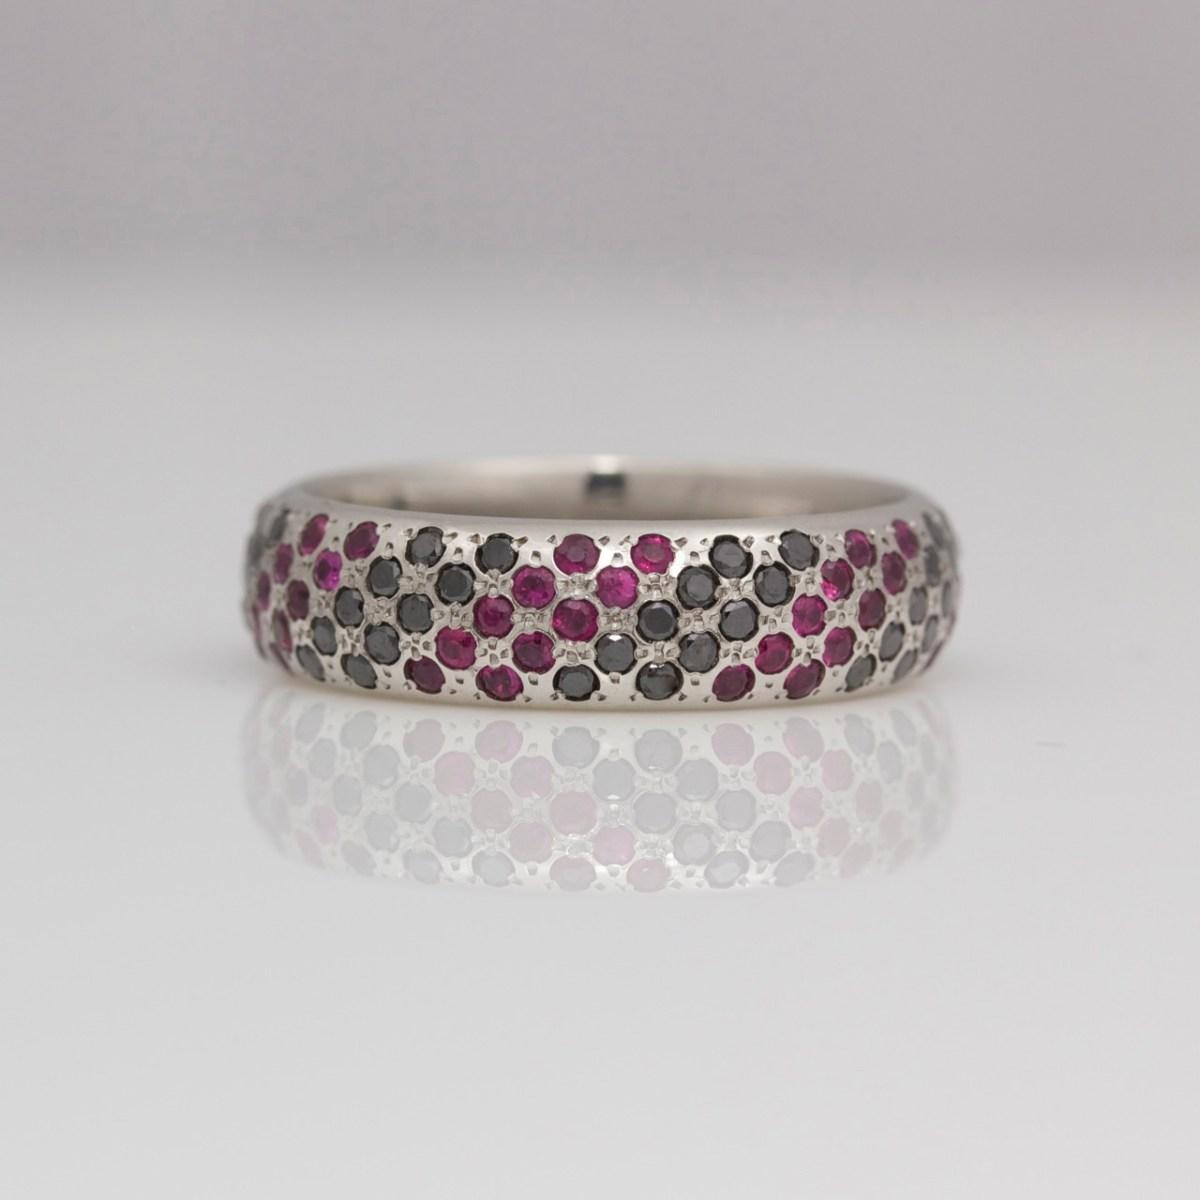 rubies black diamonds pav 233 set in platinum ring david